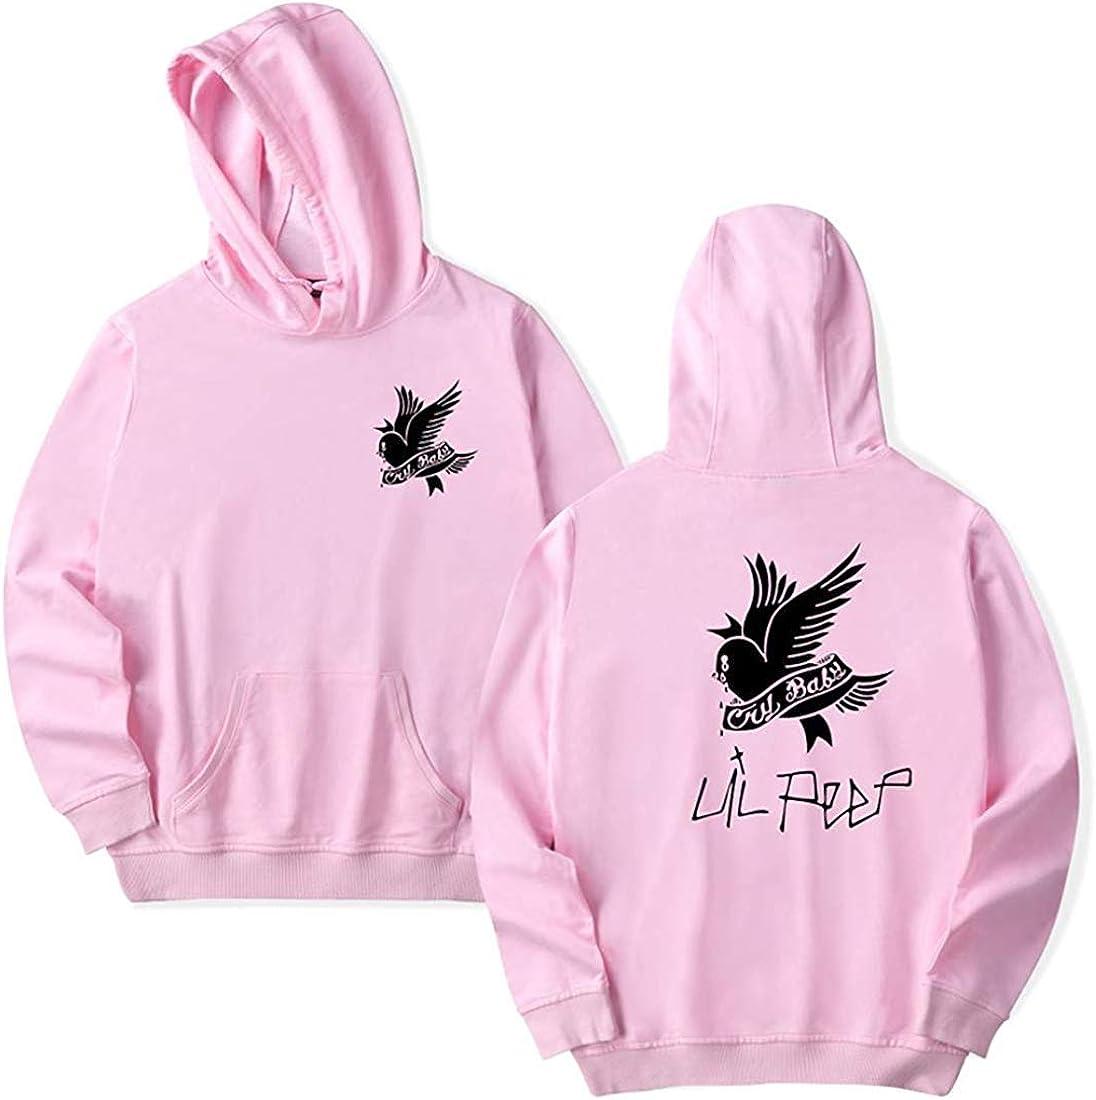 Mfasica Women Plaid Pullover Skinny Hoode Casual Athletic Sweatshirts